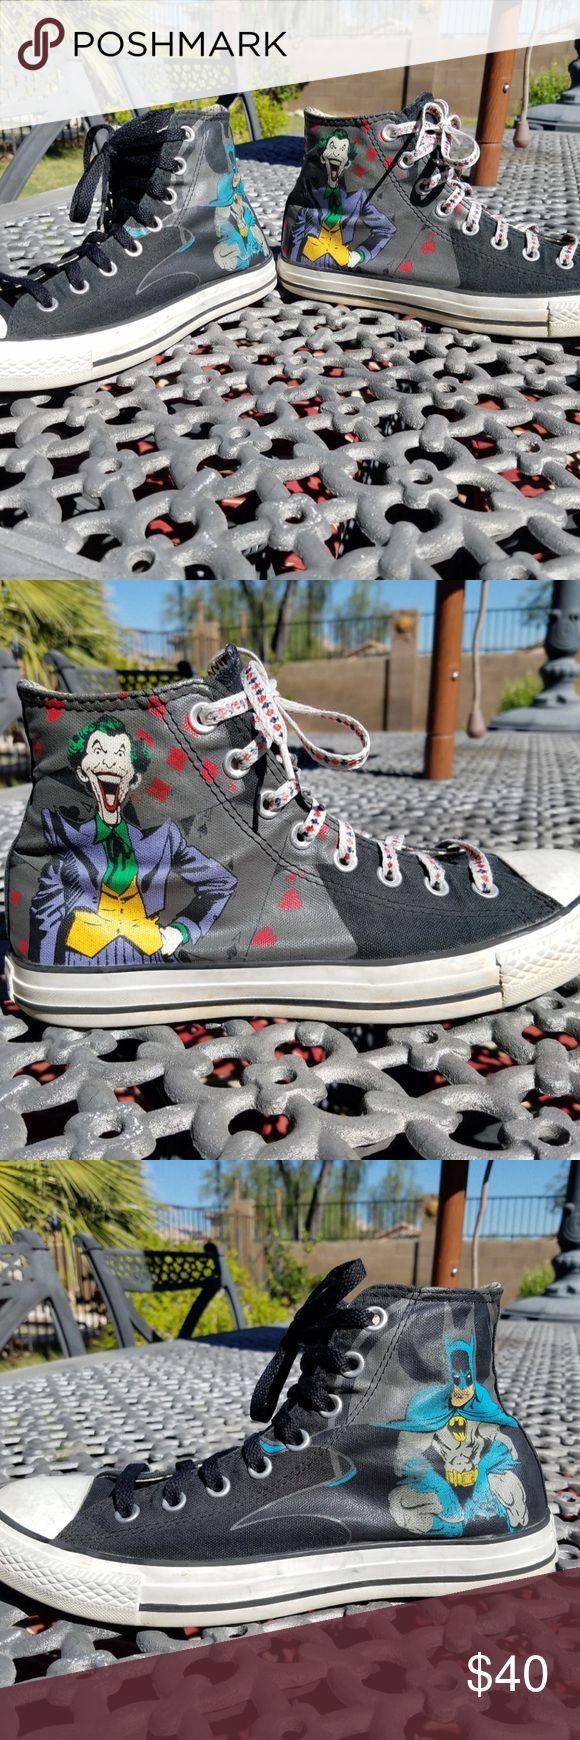 Converse DC Comics Batman/ Joker size 8M/ 10W Good condition Converse Shoes Sneakers